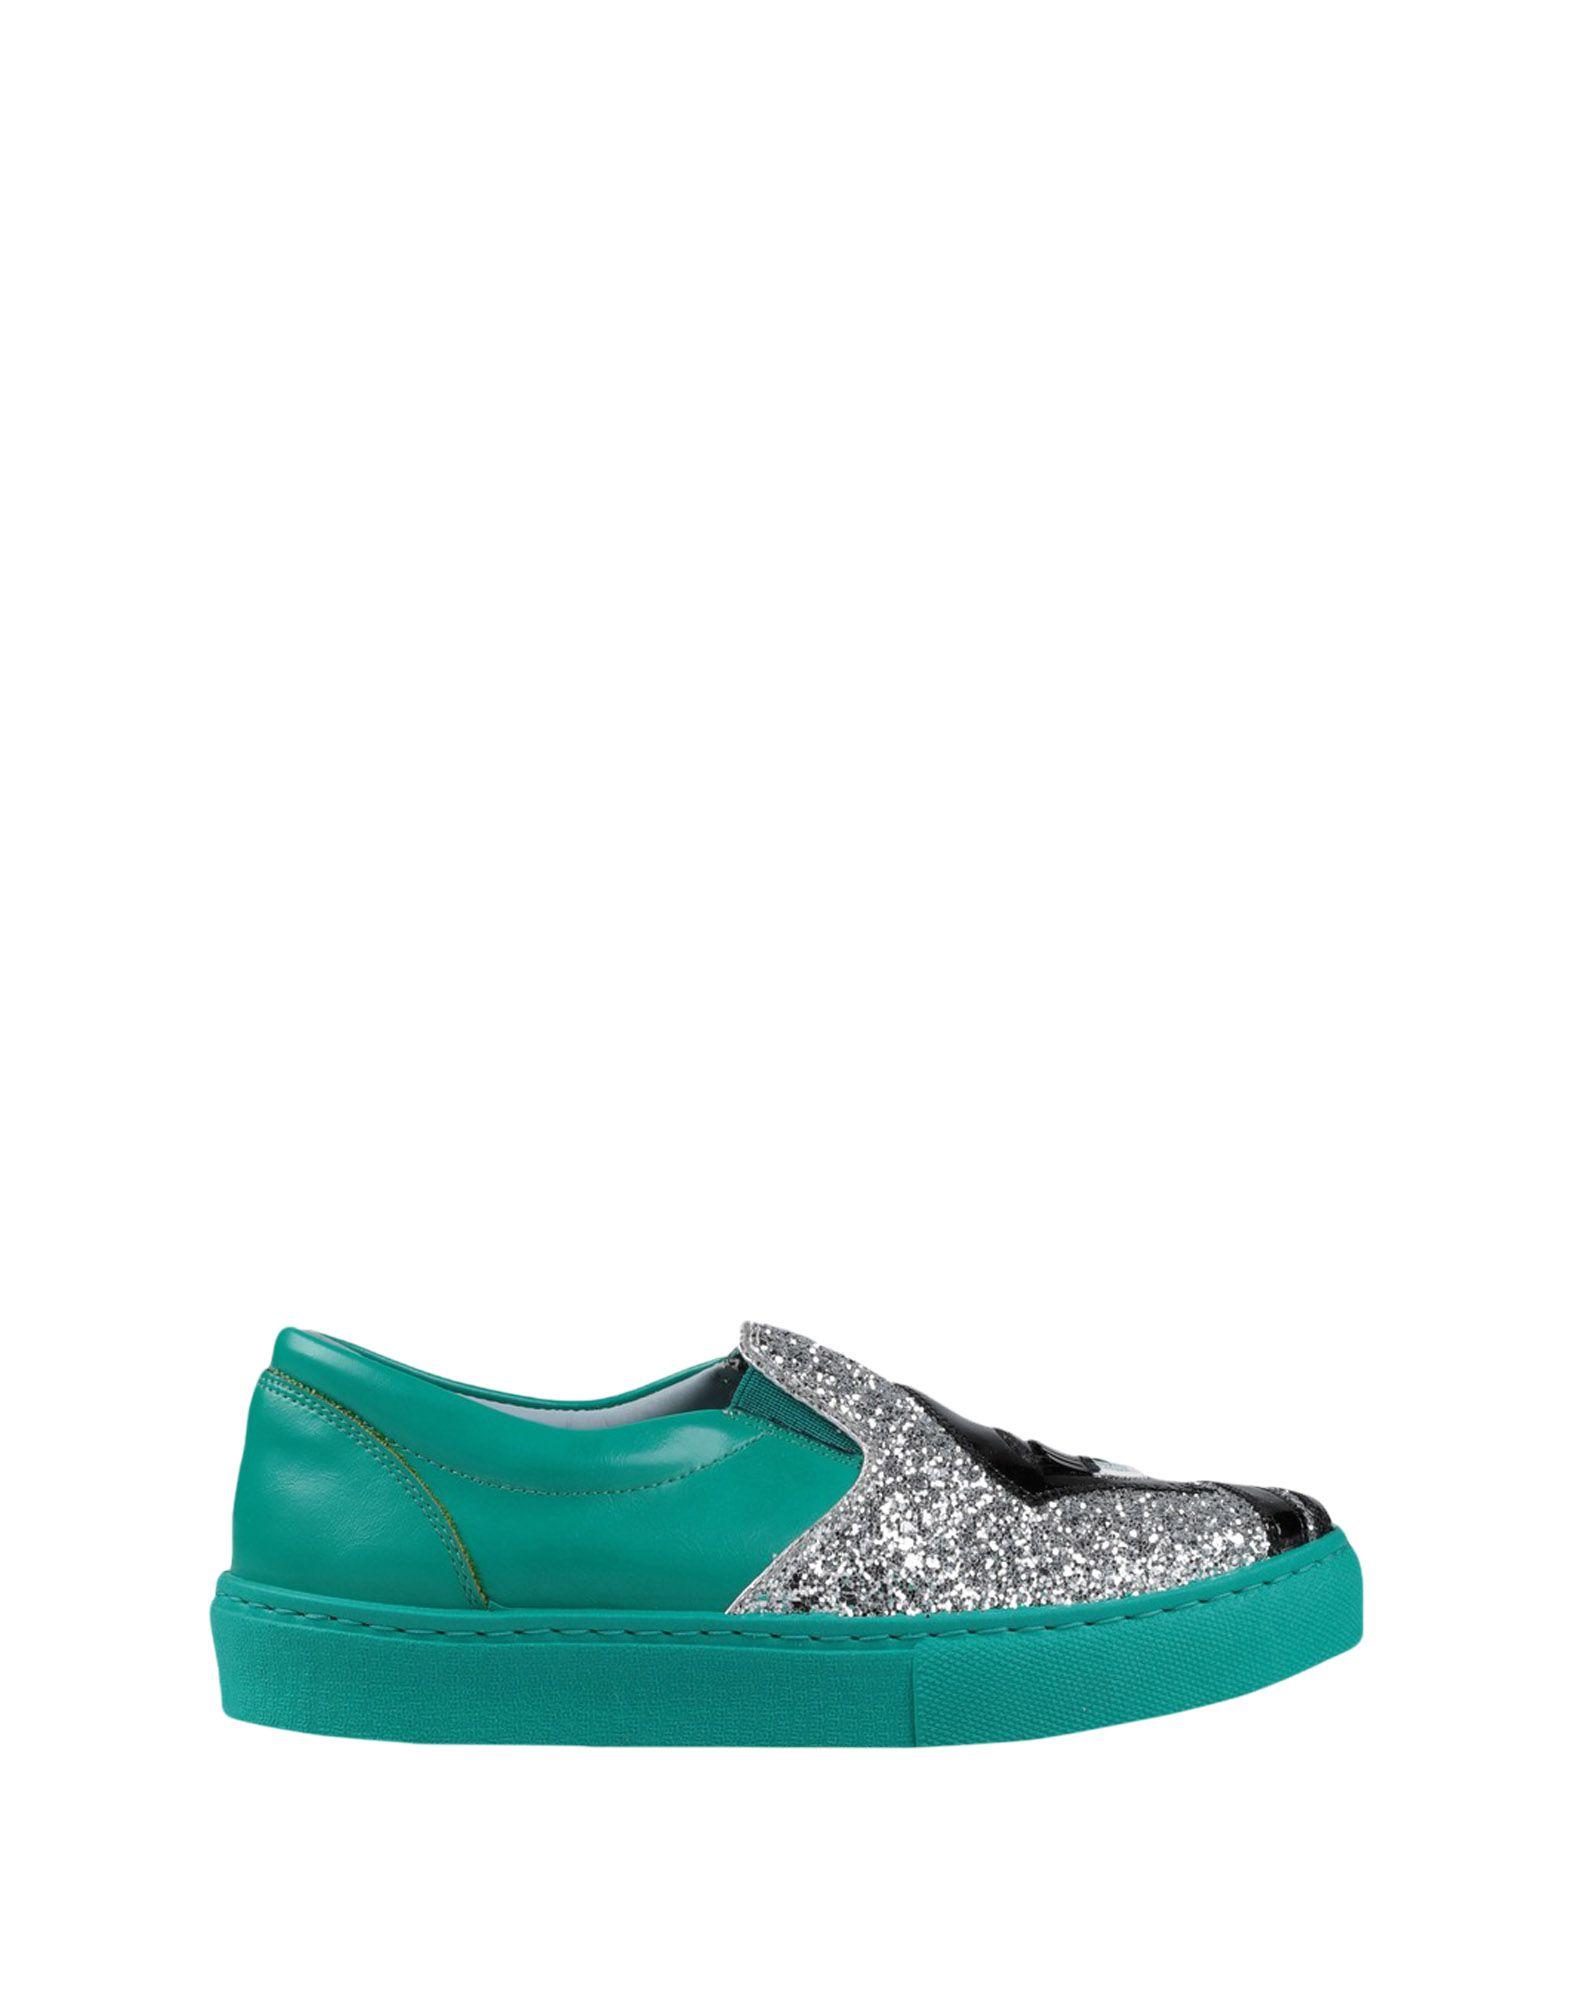 Stilvolle billige Schuhe Chiara Ferragni 11554668KX Sneakers Damen  11554668KX Ferragni 4710d2